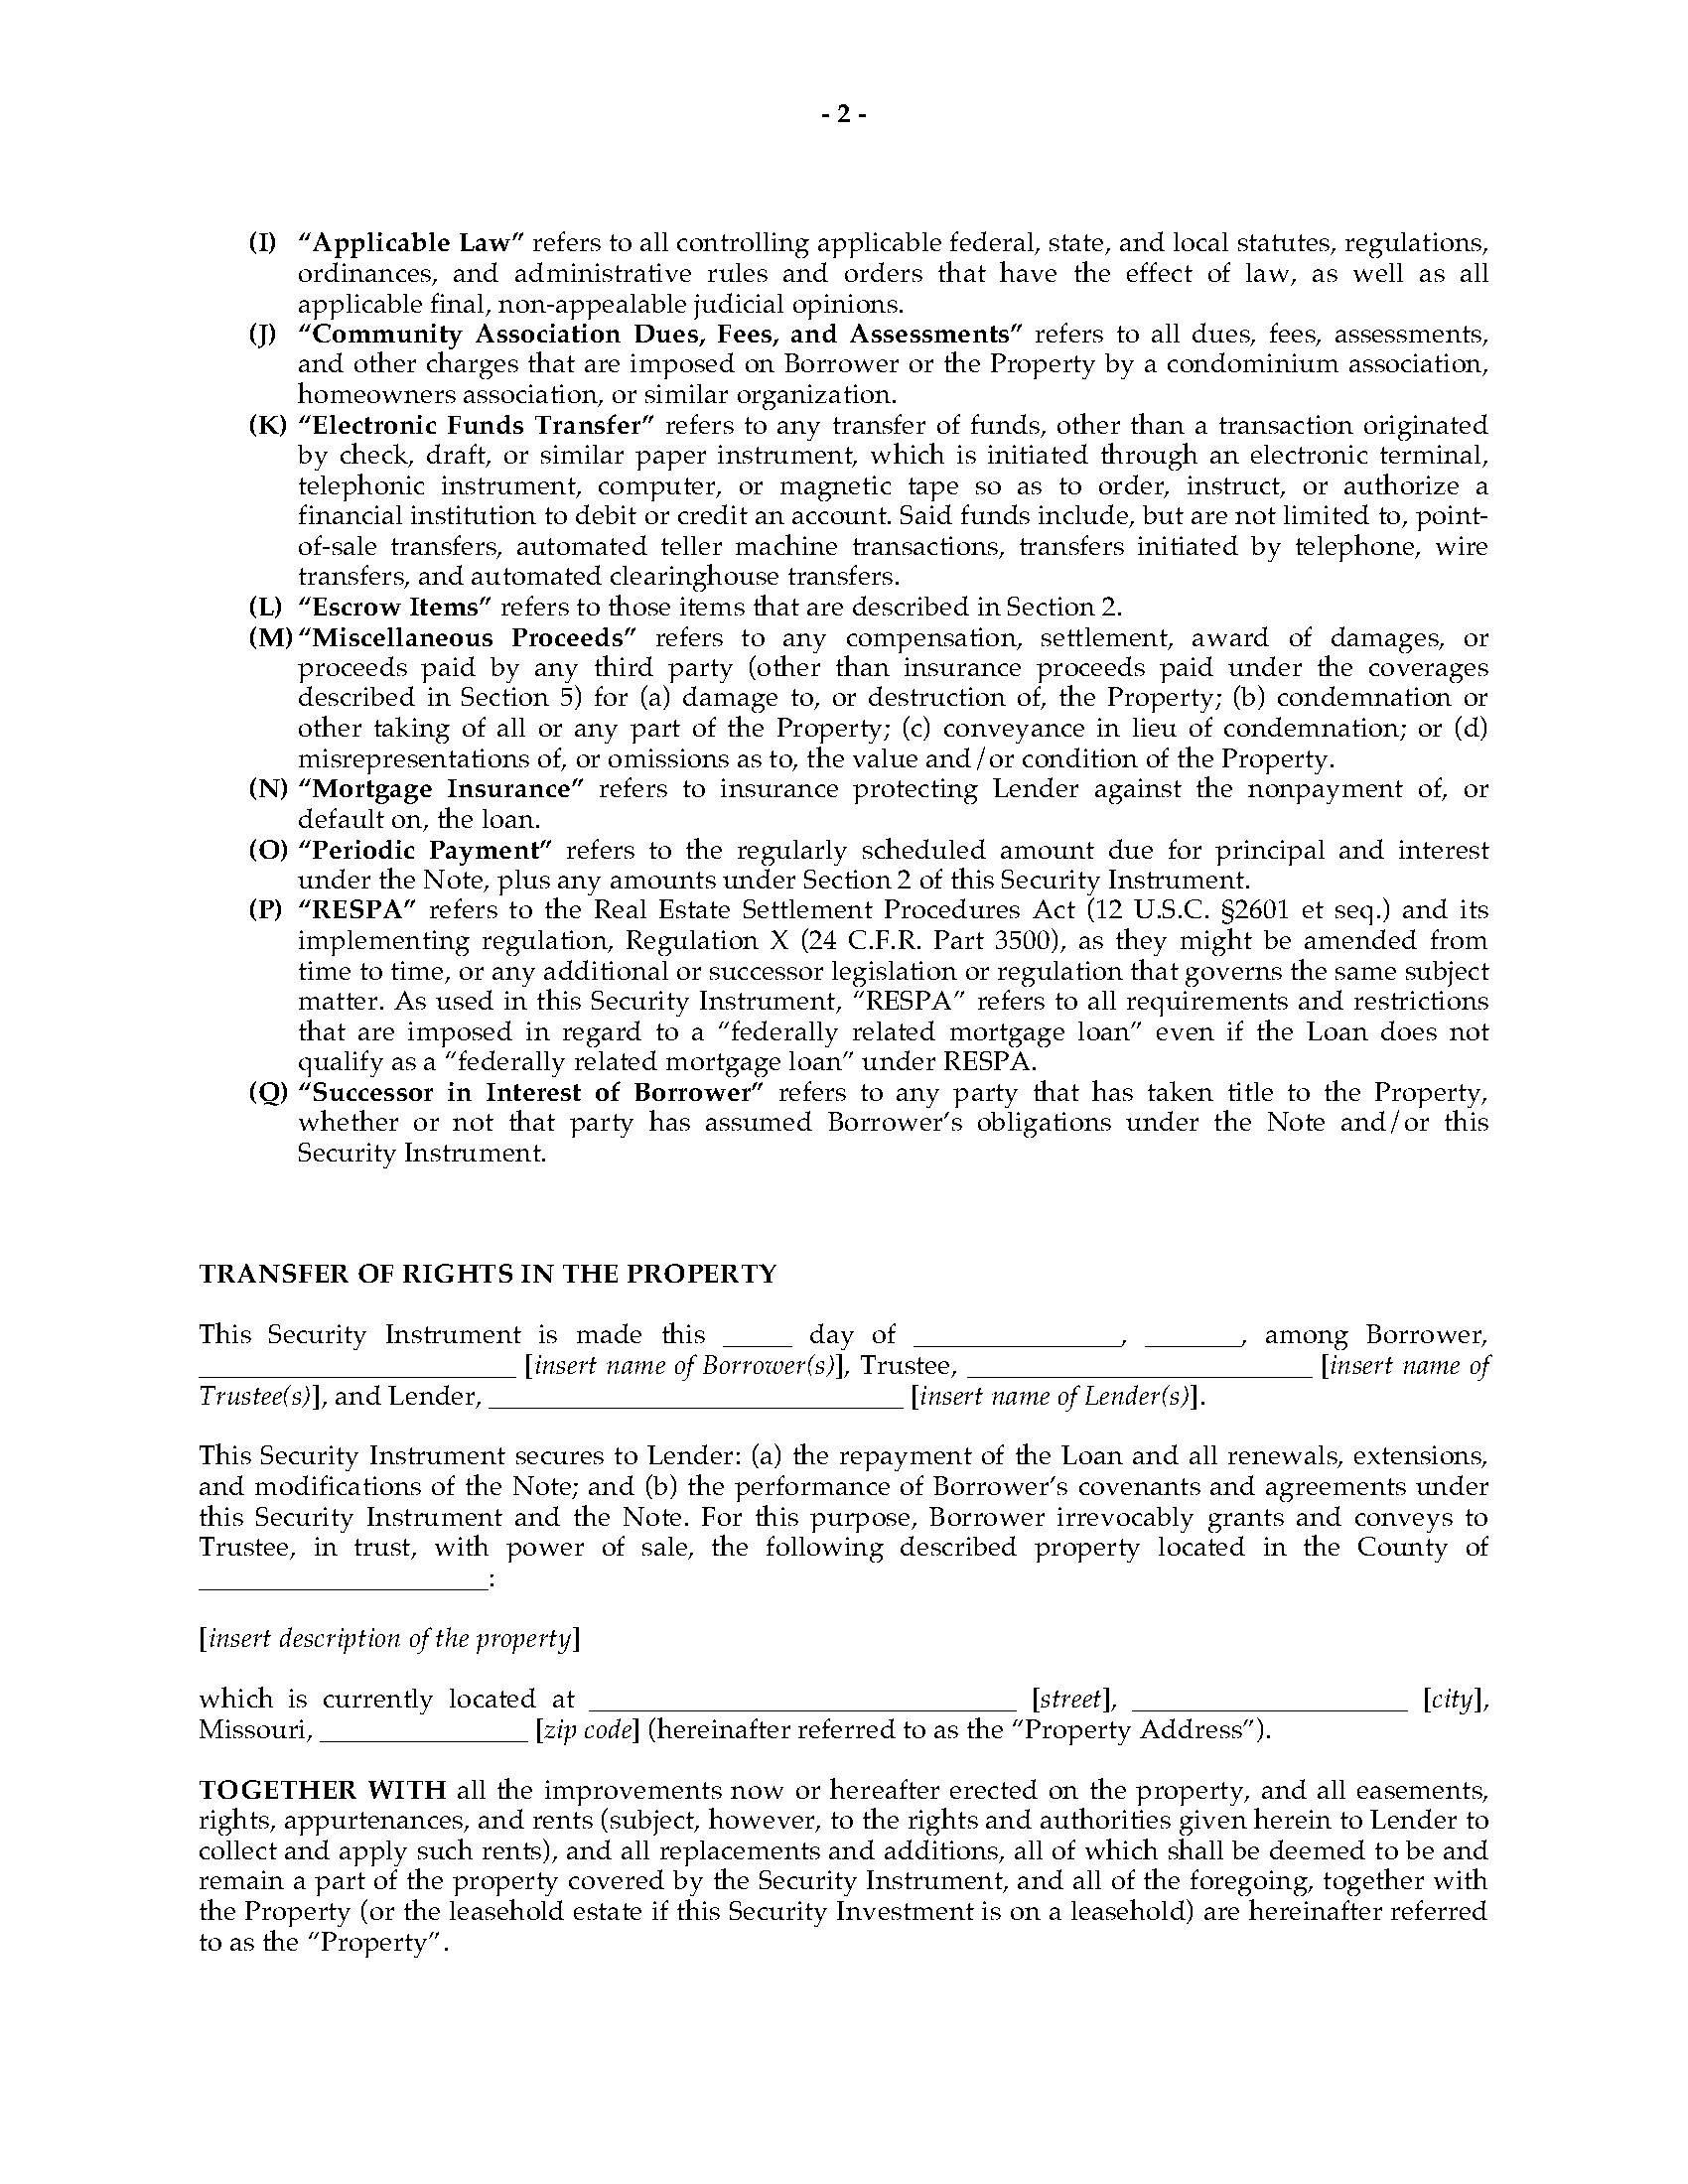 Missouri Deed Of Trust Template